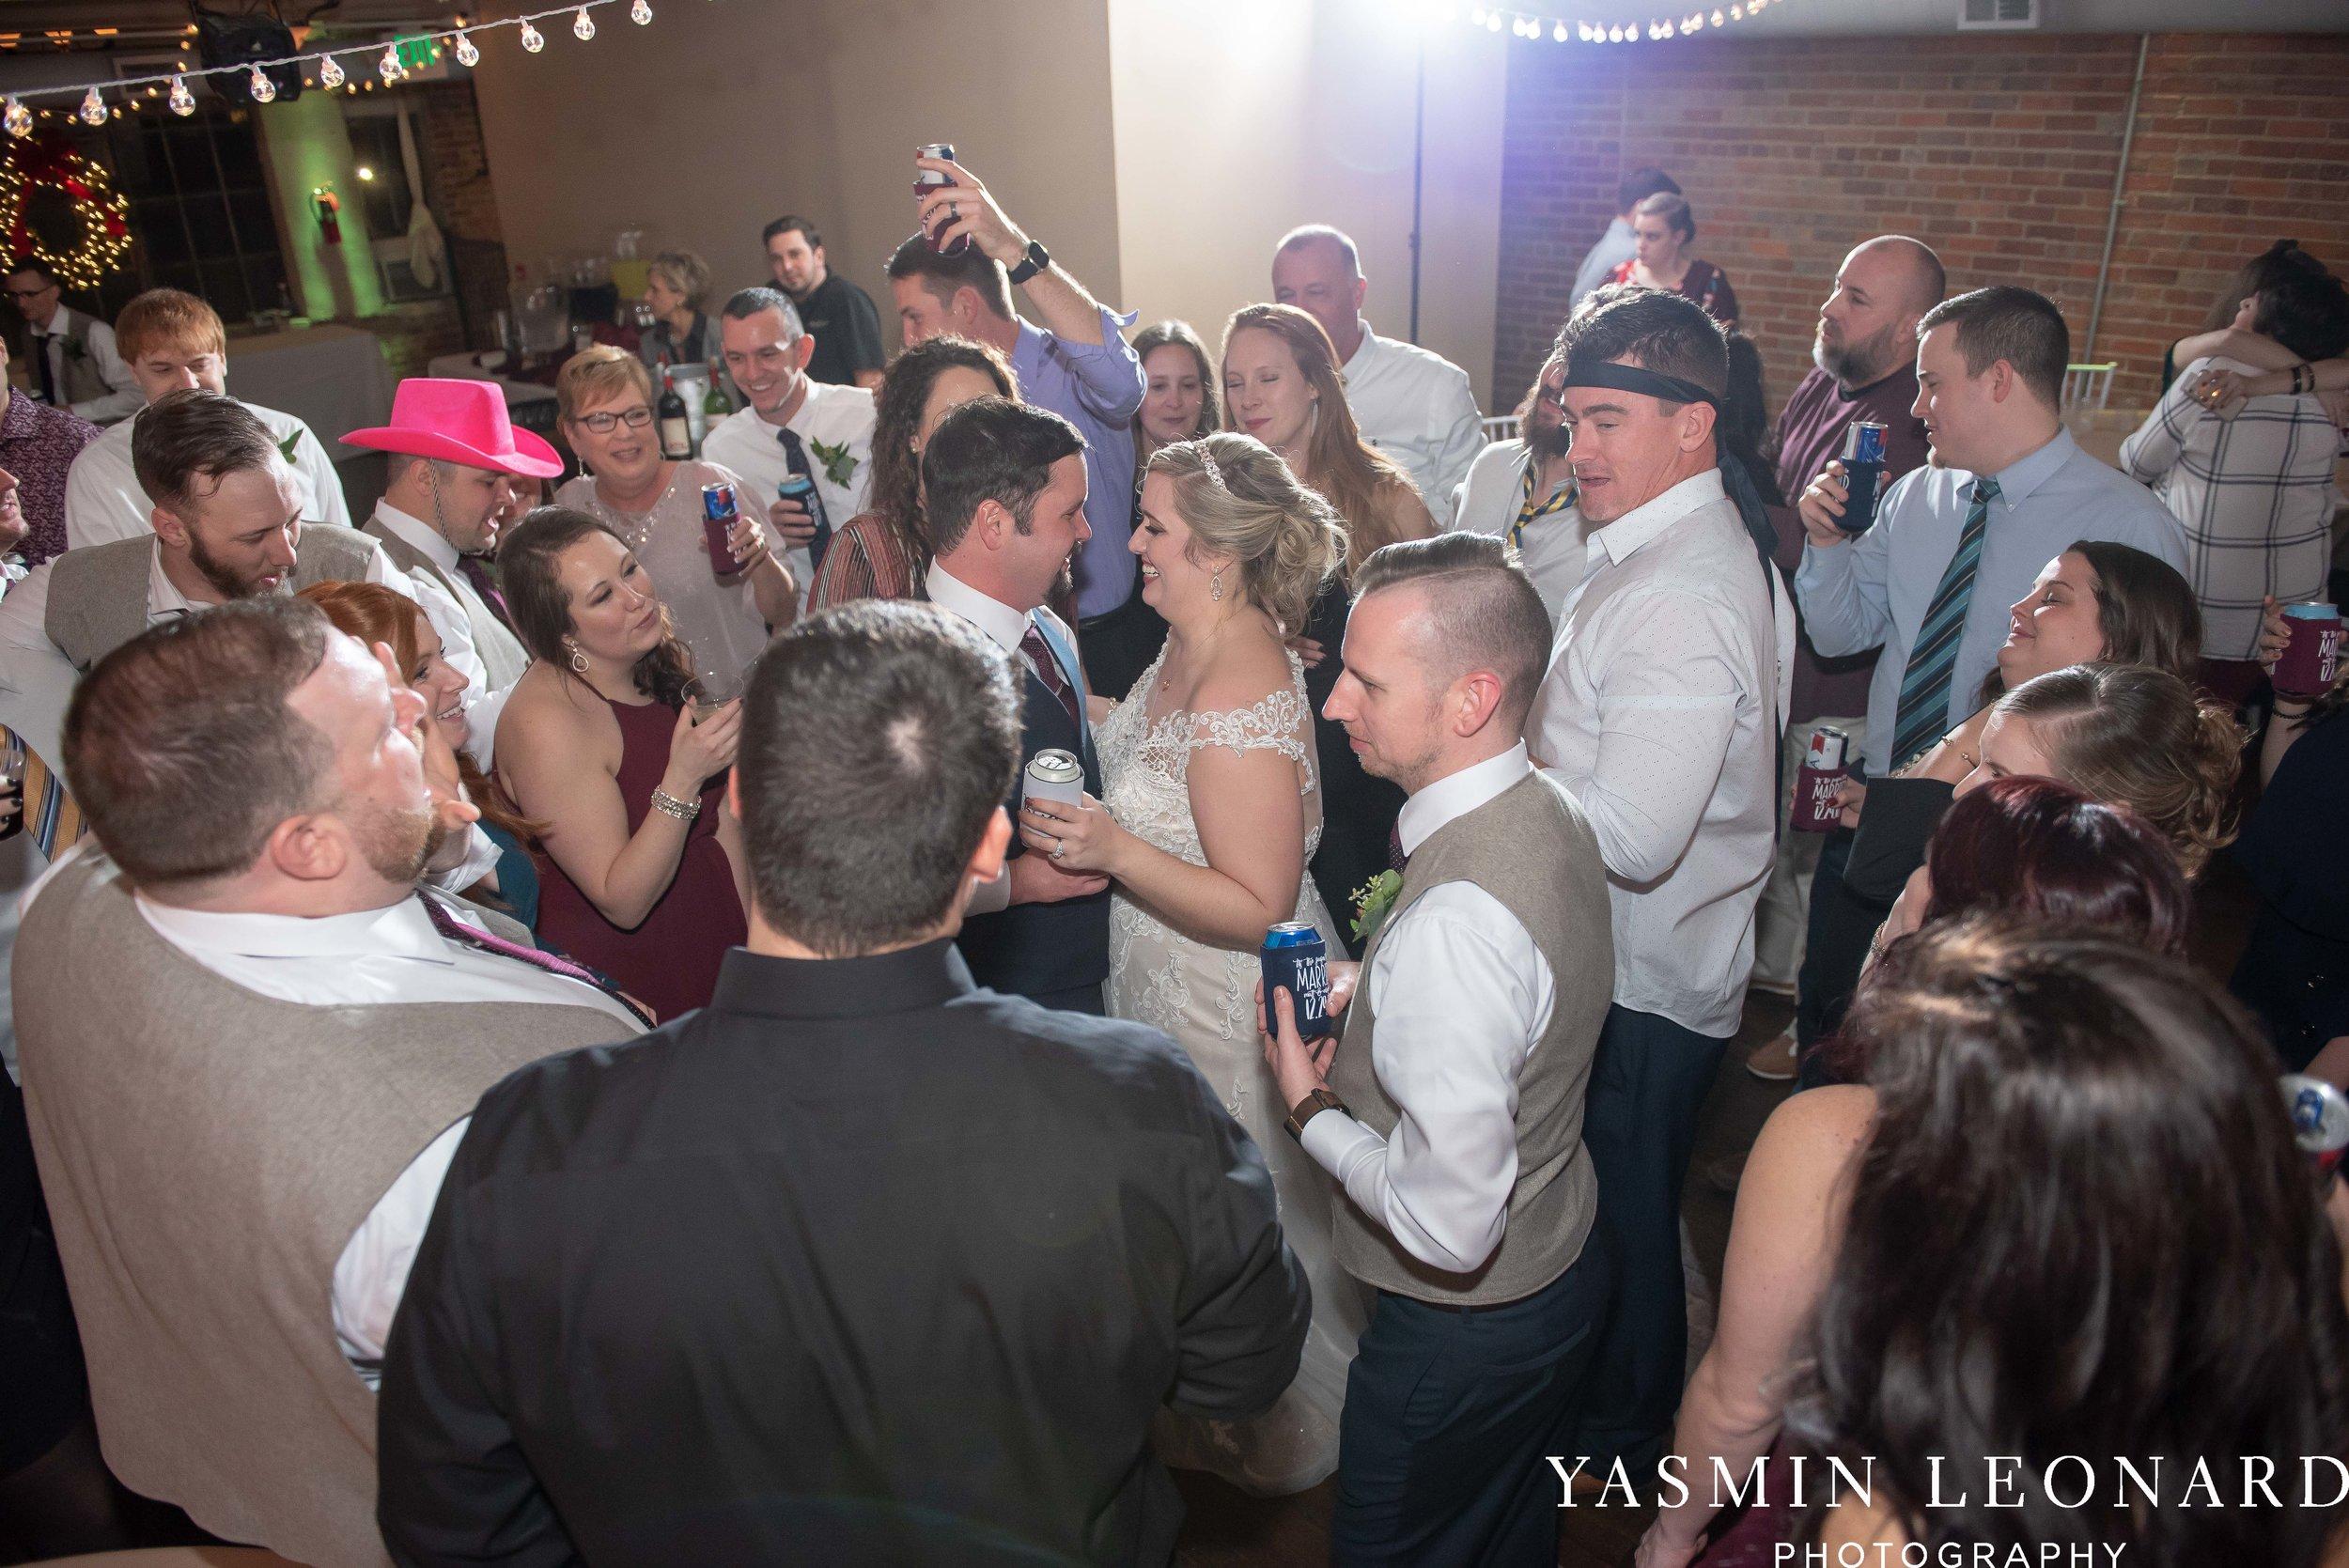 Rebekah and Matt - 105 Worth Event Centre - Yasmin Leonard Photography - Asheboro Wedding - NC Wedding - High Point Weddings - Triad Weddings - Winter Wedding-81.jpg